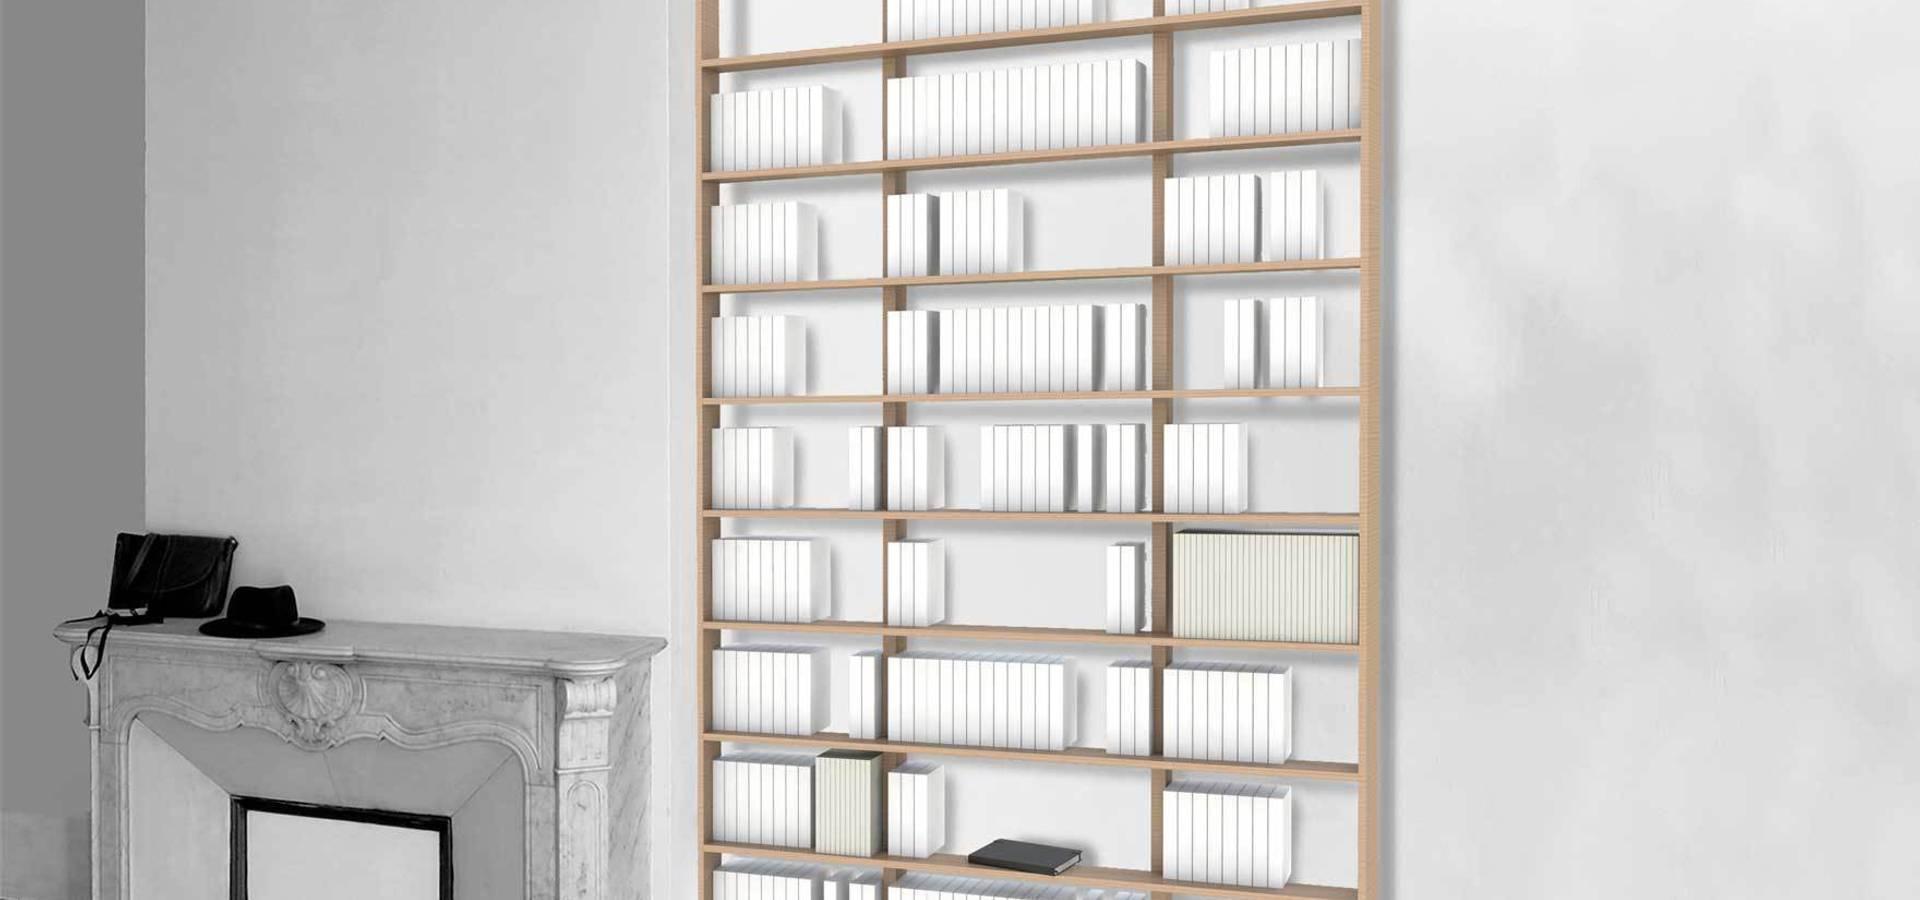 biblioth que wallbook malherbe edition. Black Bedroom Furniture Sets. Home Design Ideas